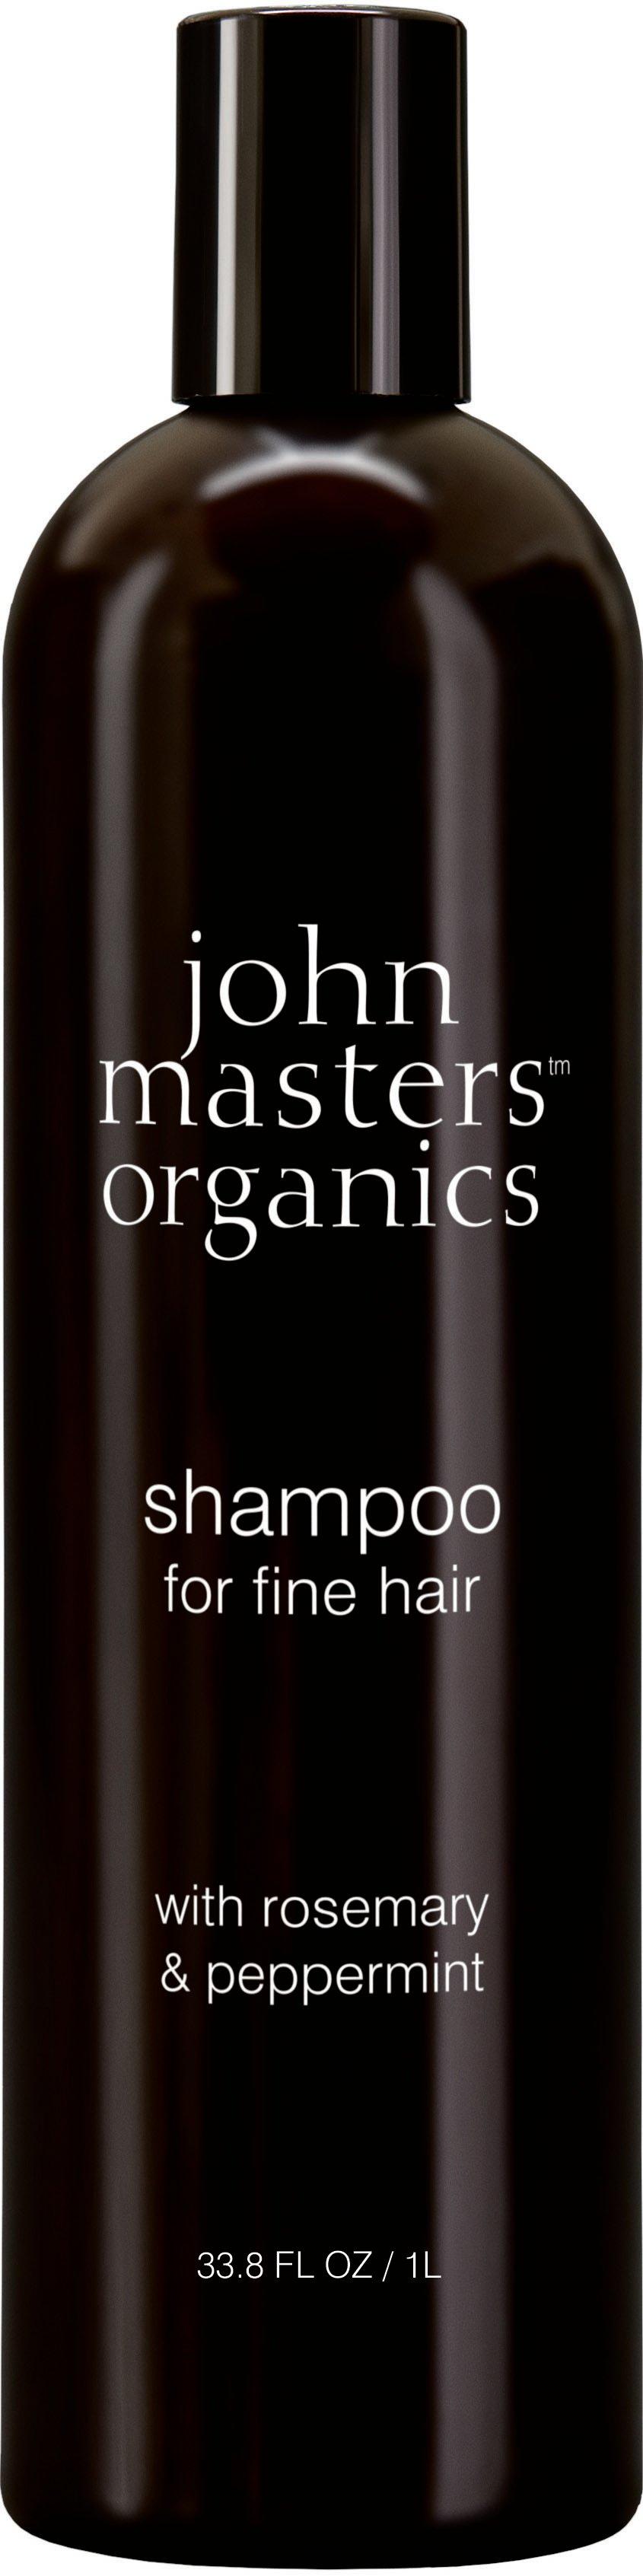 John Masters Organics - Shampoo for Fine Hair w. Rosemary & Peppermint 1035 ml